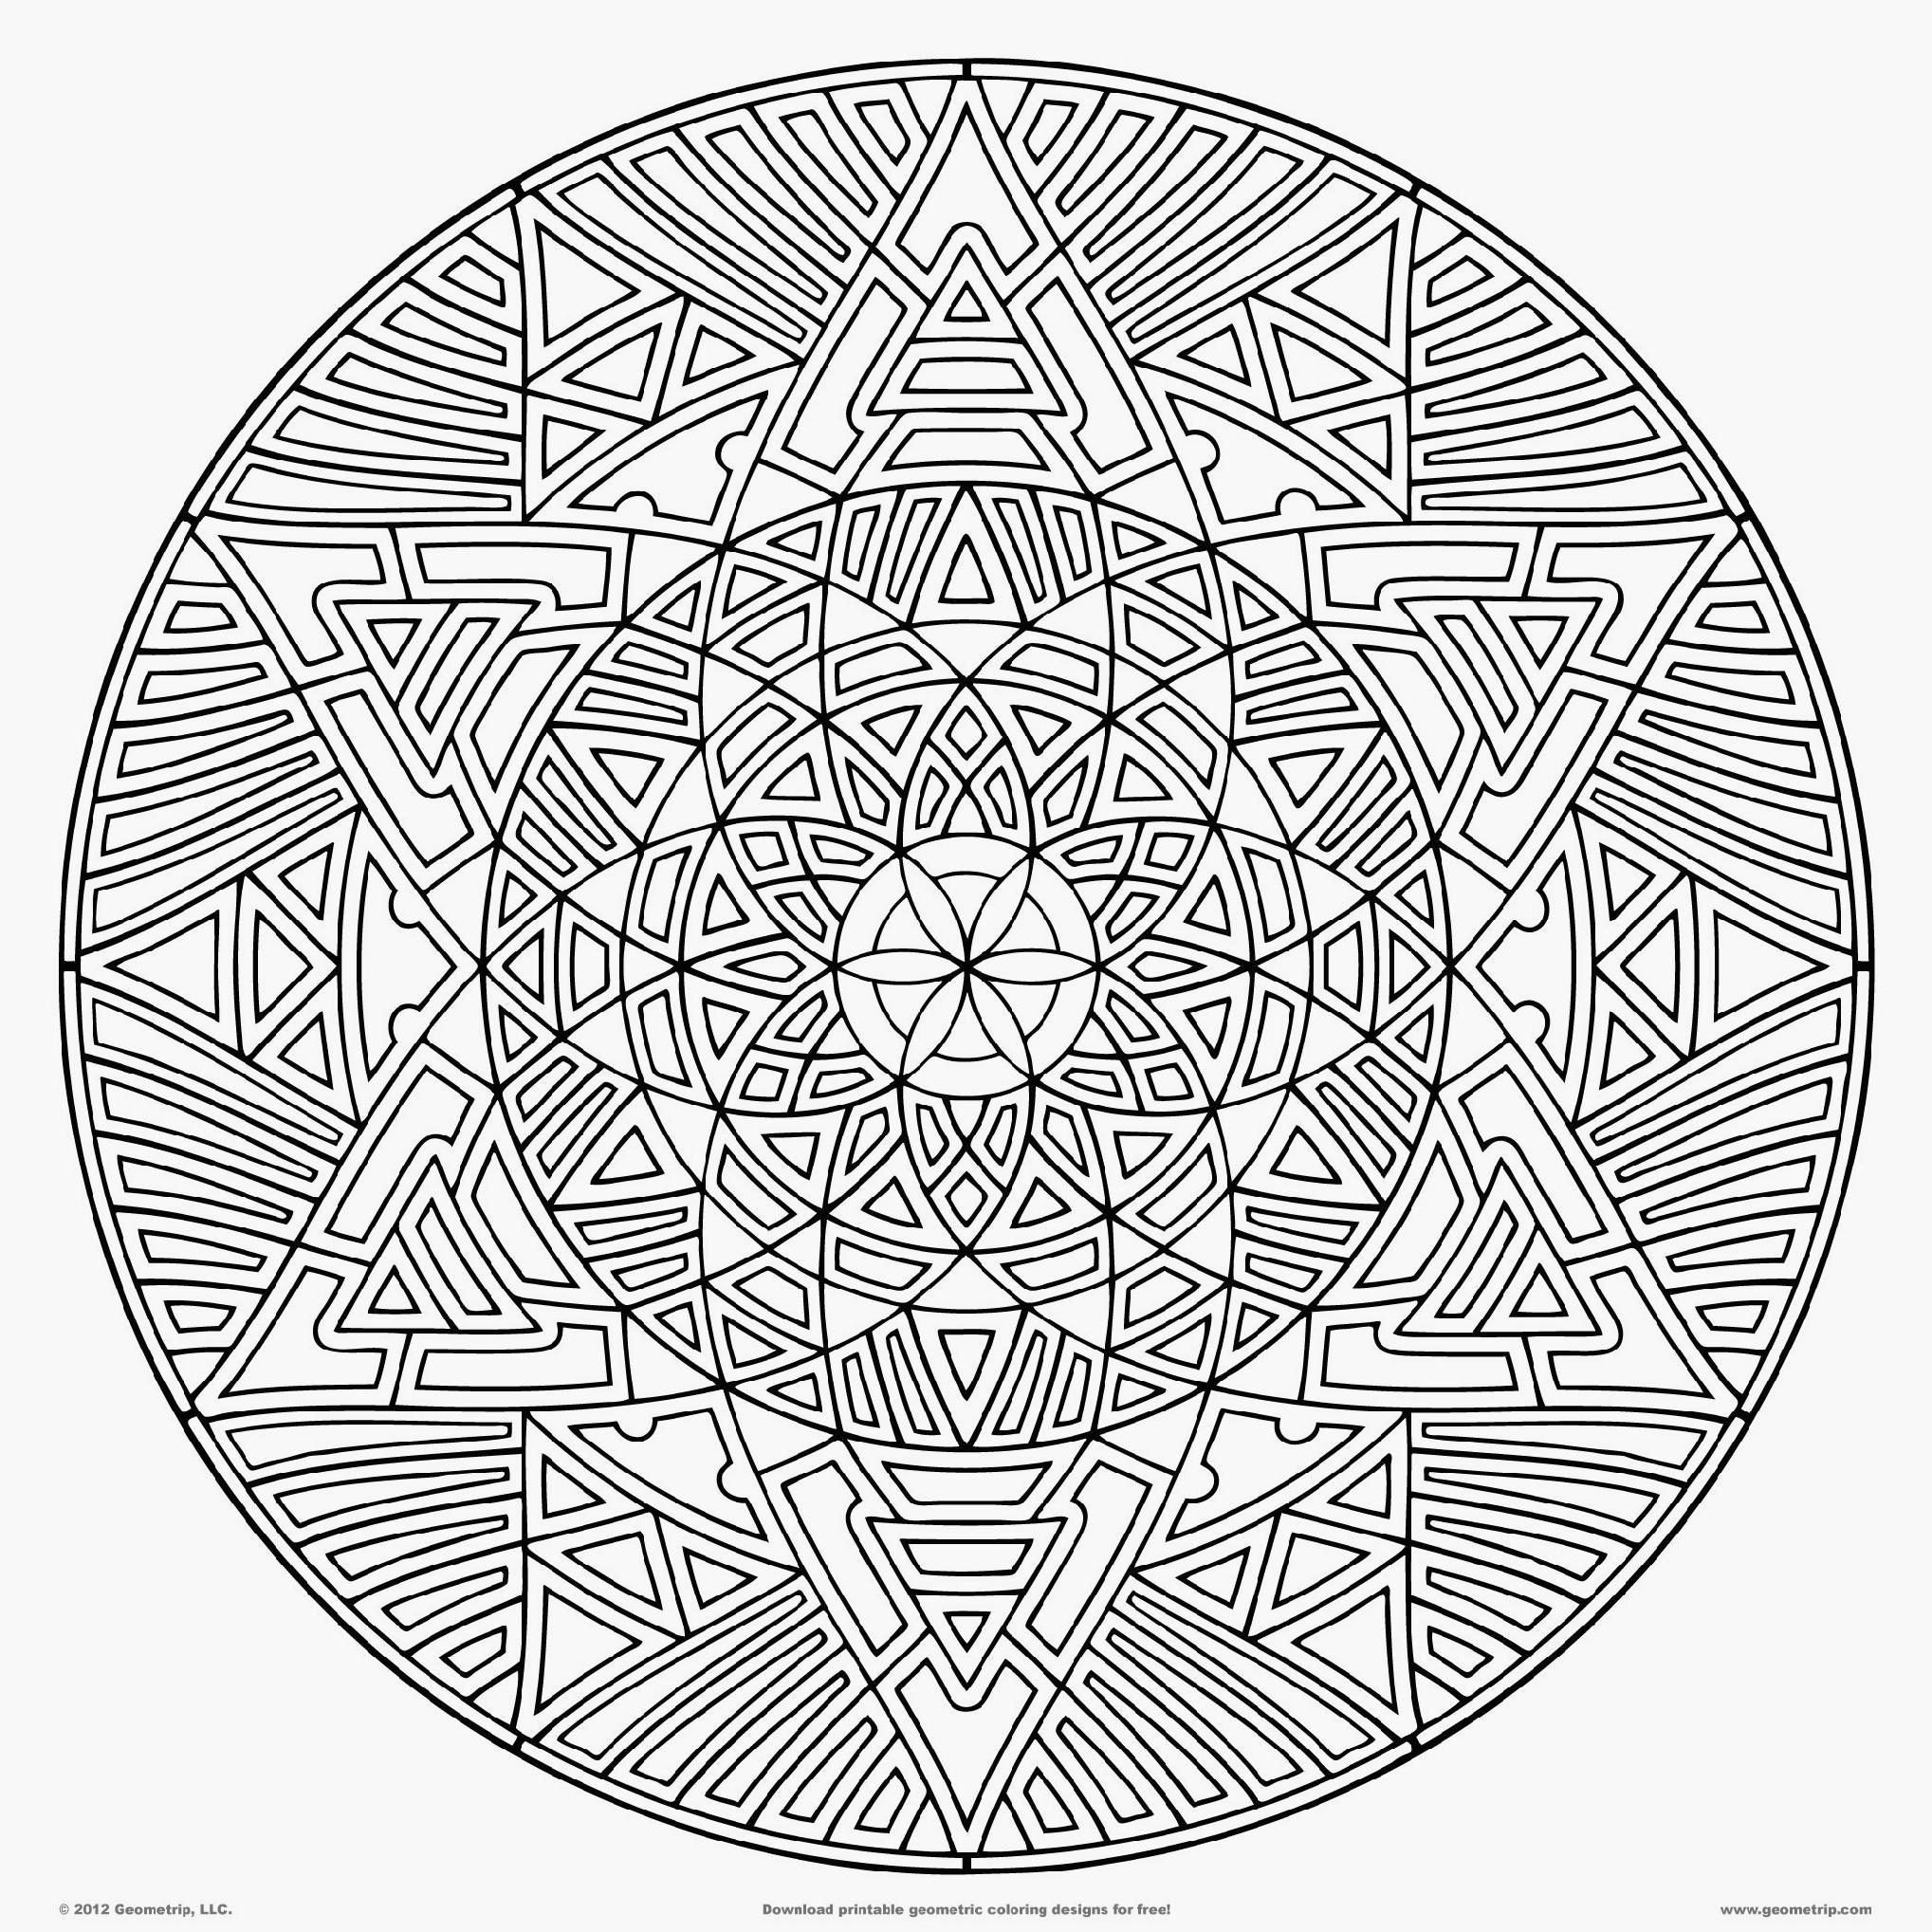 Coloriage Mandala Animaux Sauvages.Coloriage Mandala Animaux Gratuit A Imprimer Laborde Yves